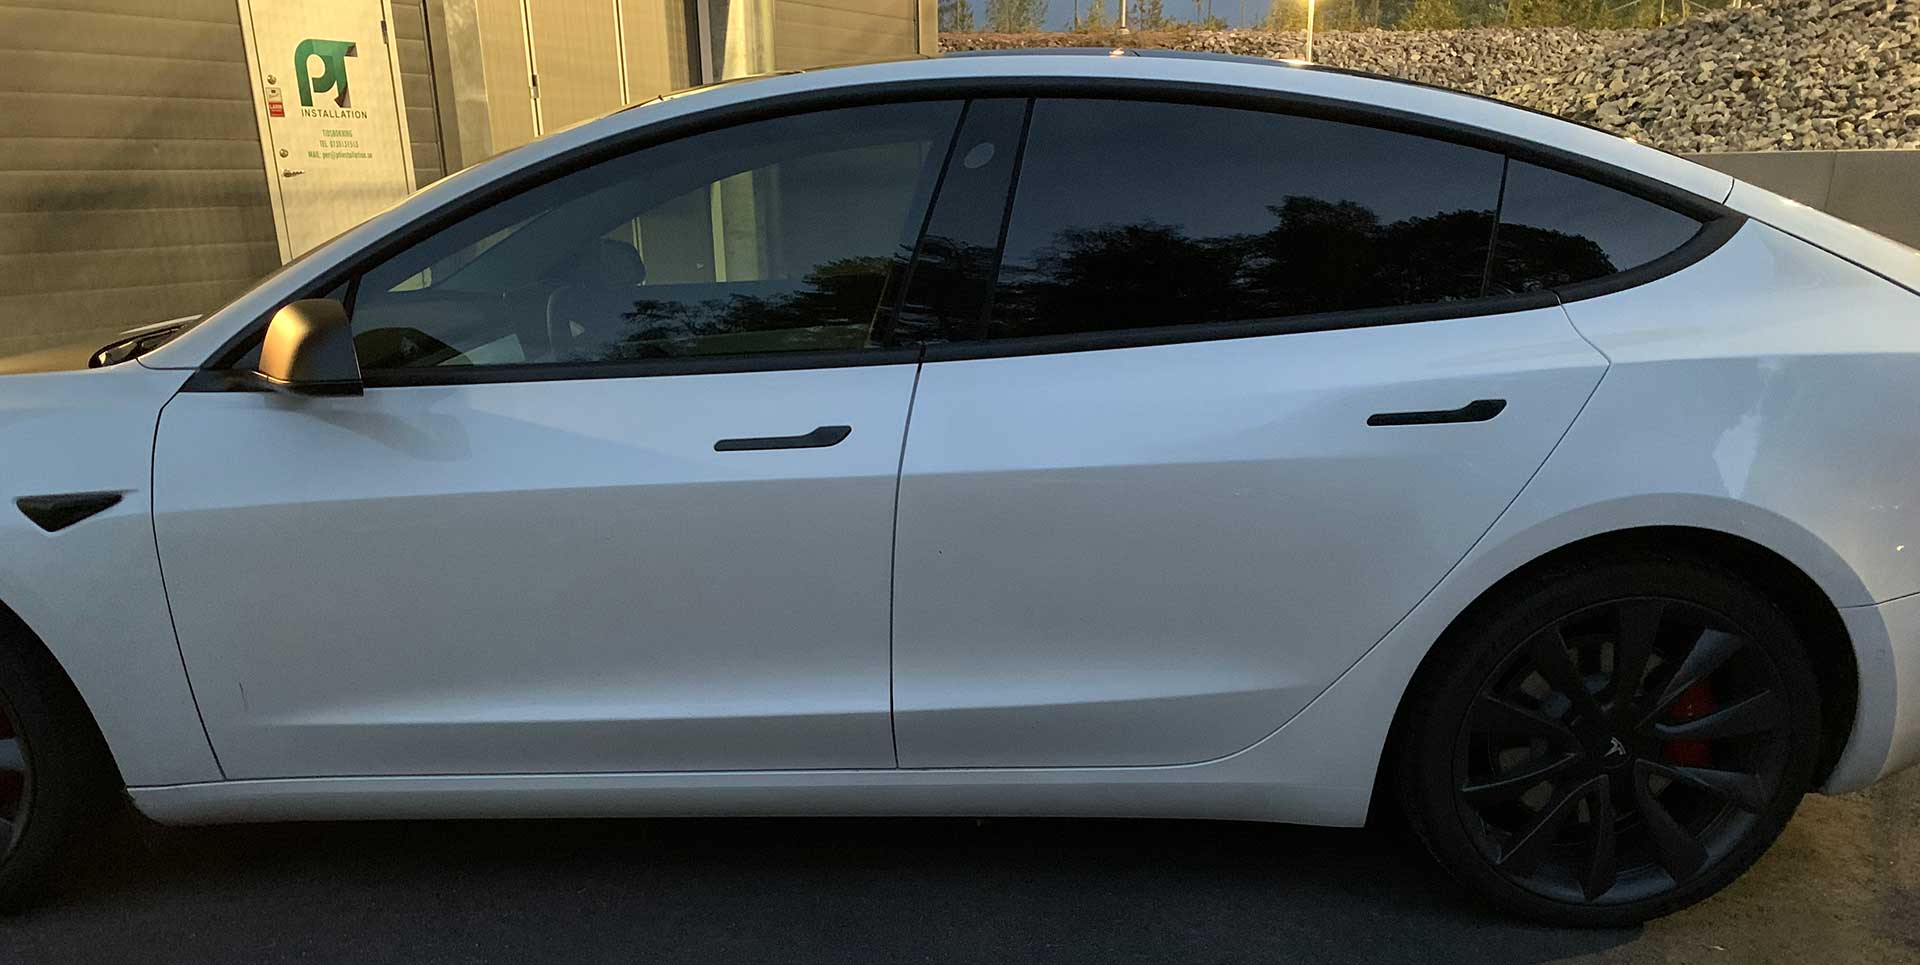 Tonade rutor på vit bil